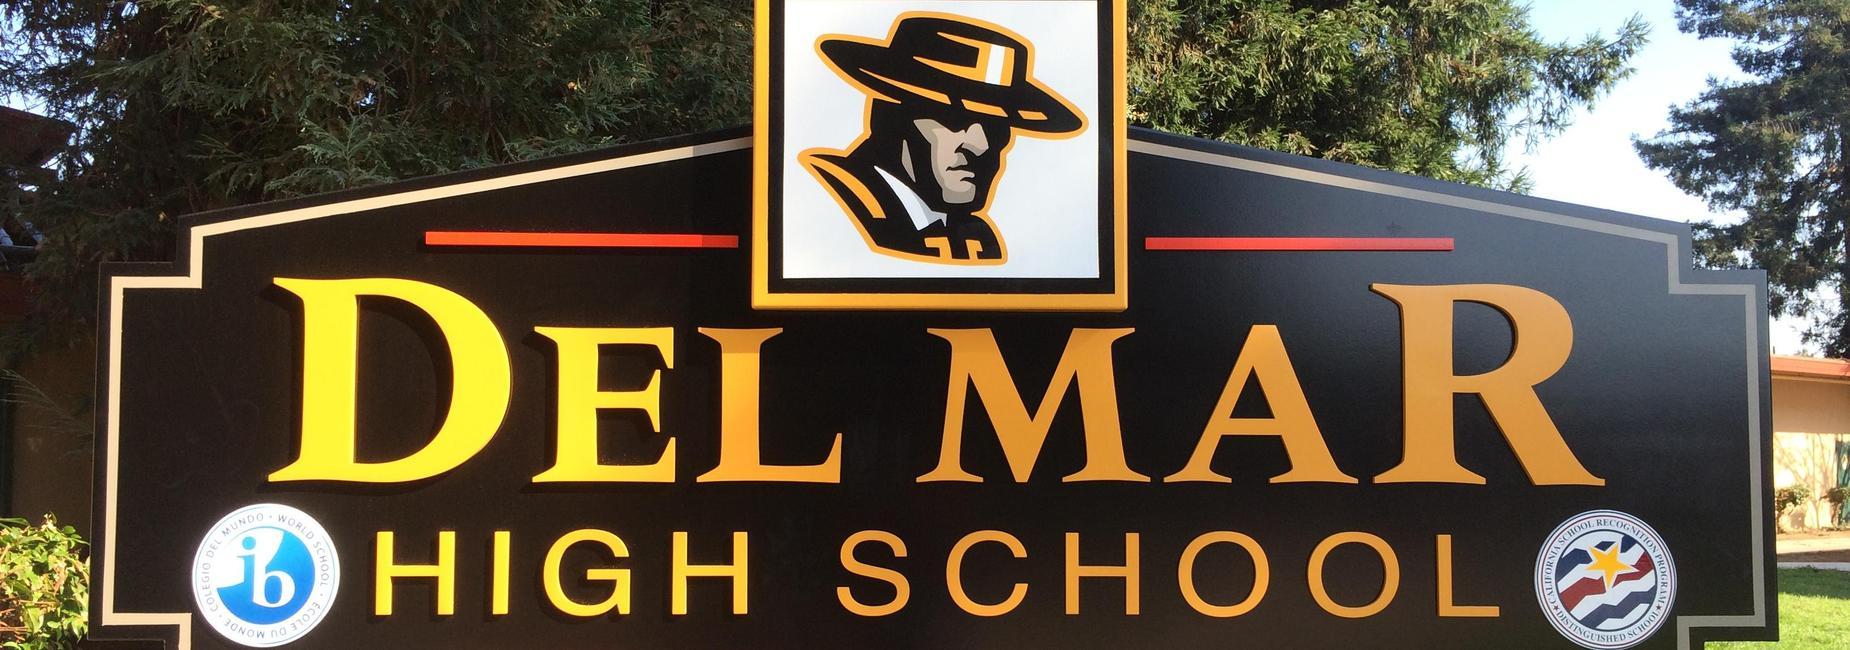 Image of Del Mar High School Sign